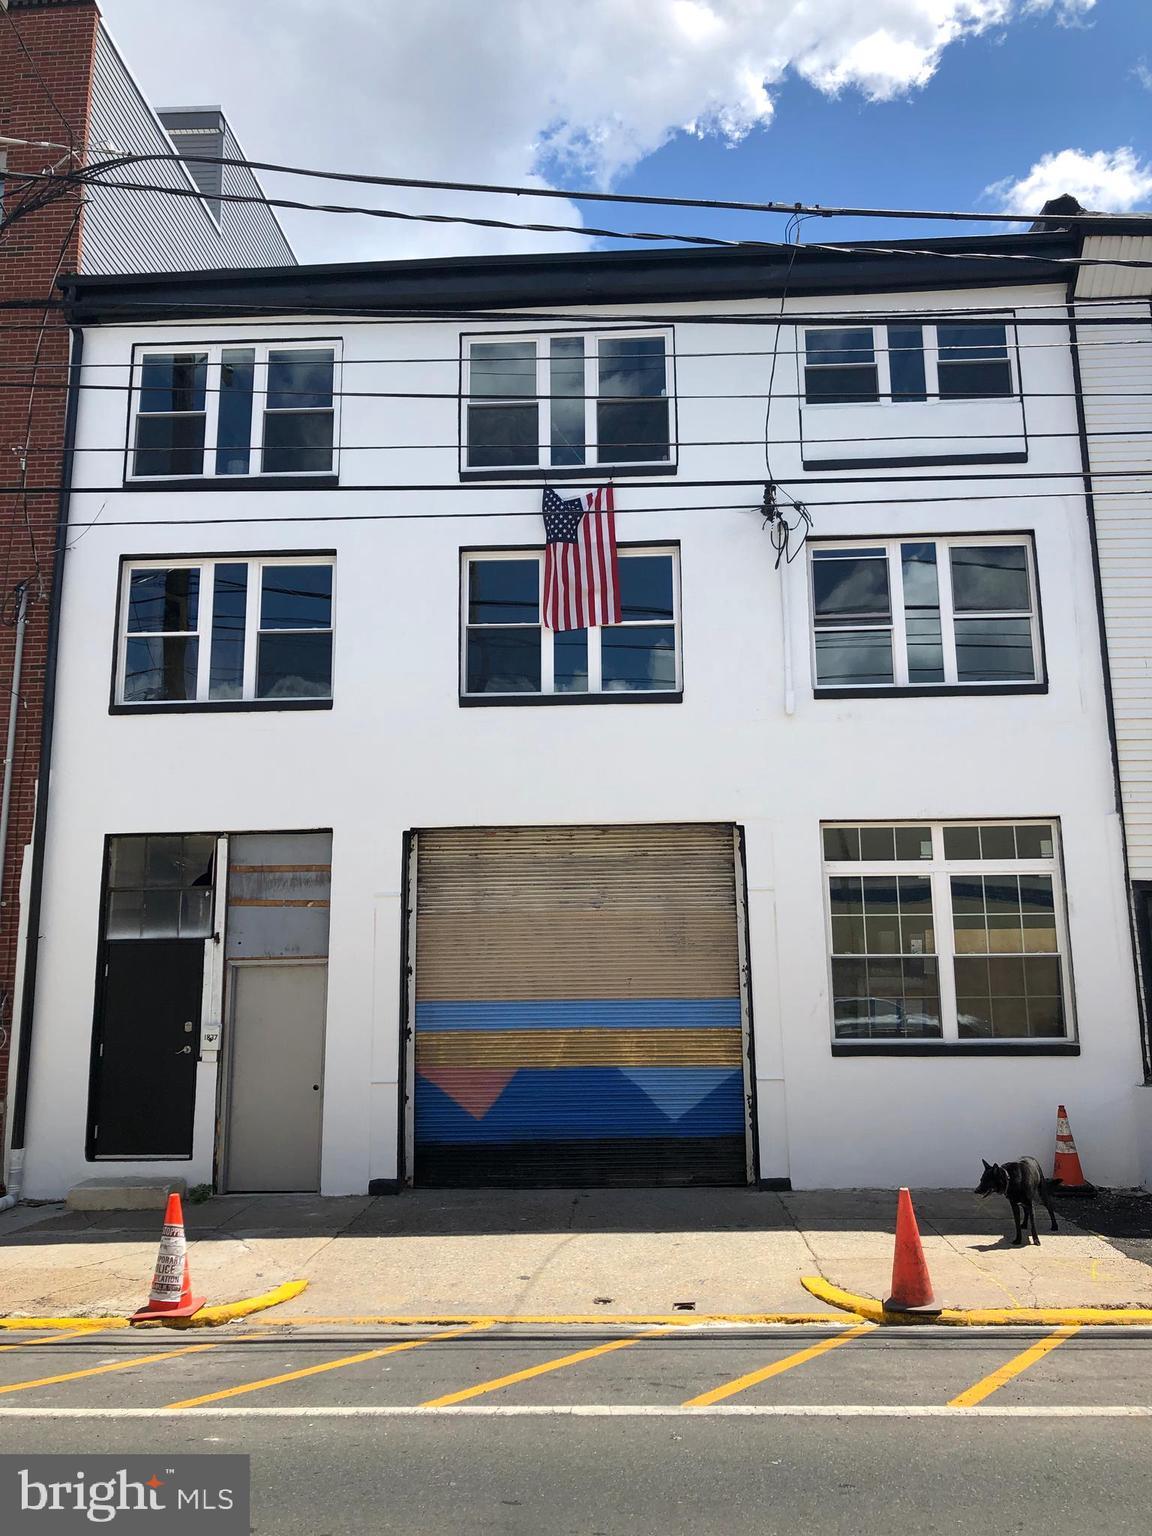 1837 N 2ND STREET, PHILADELPHIA, PA 19122